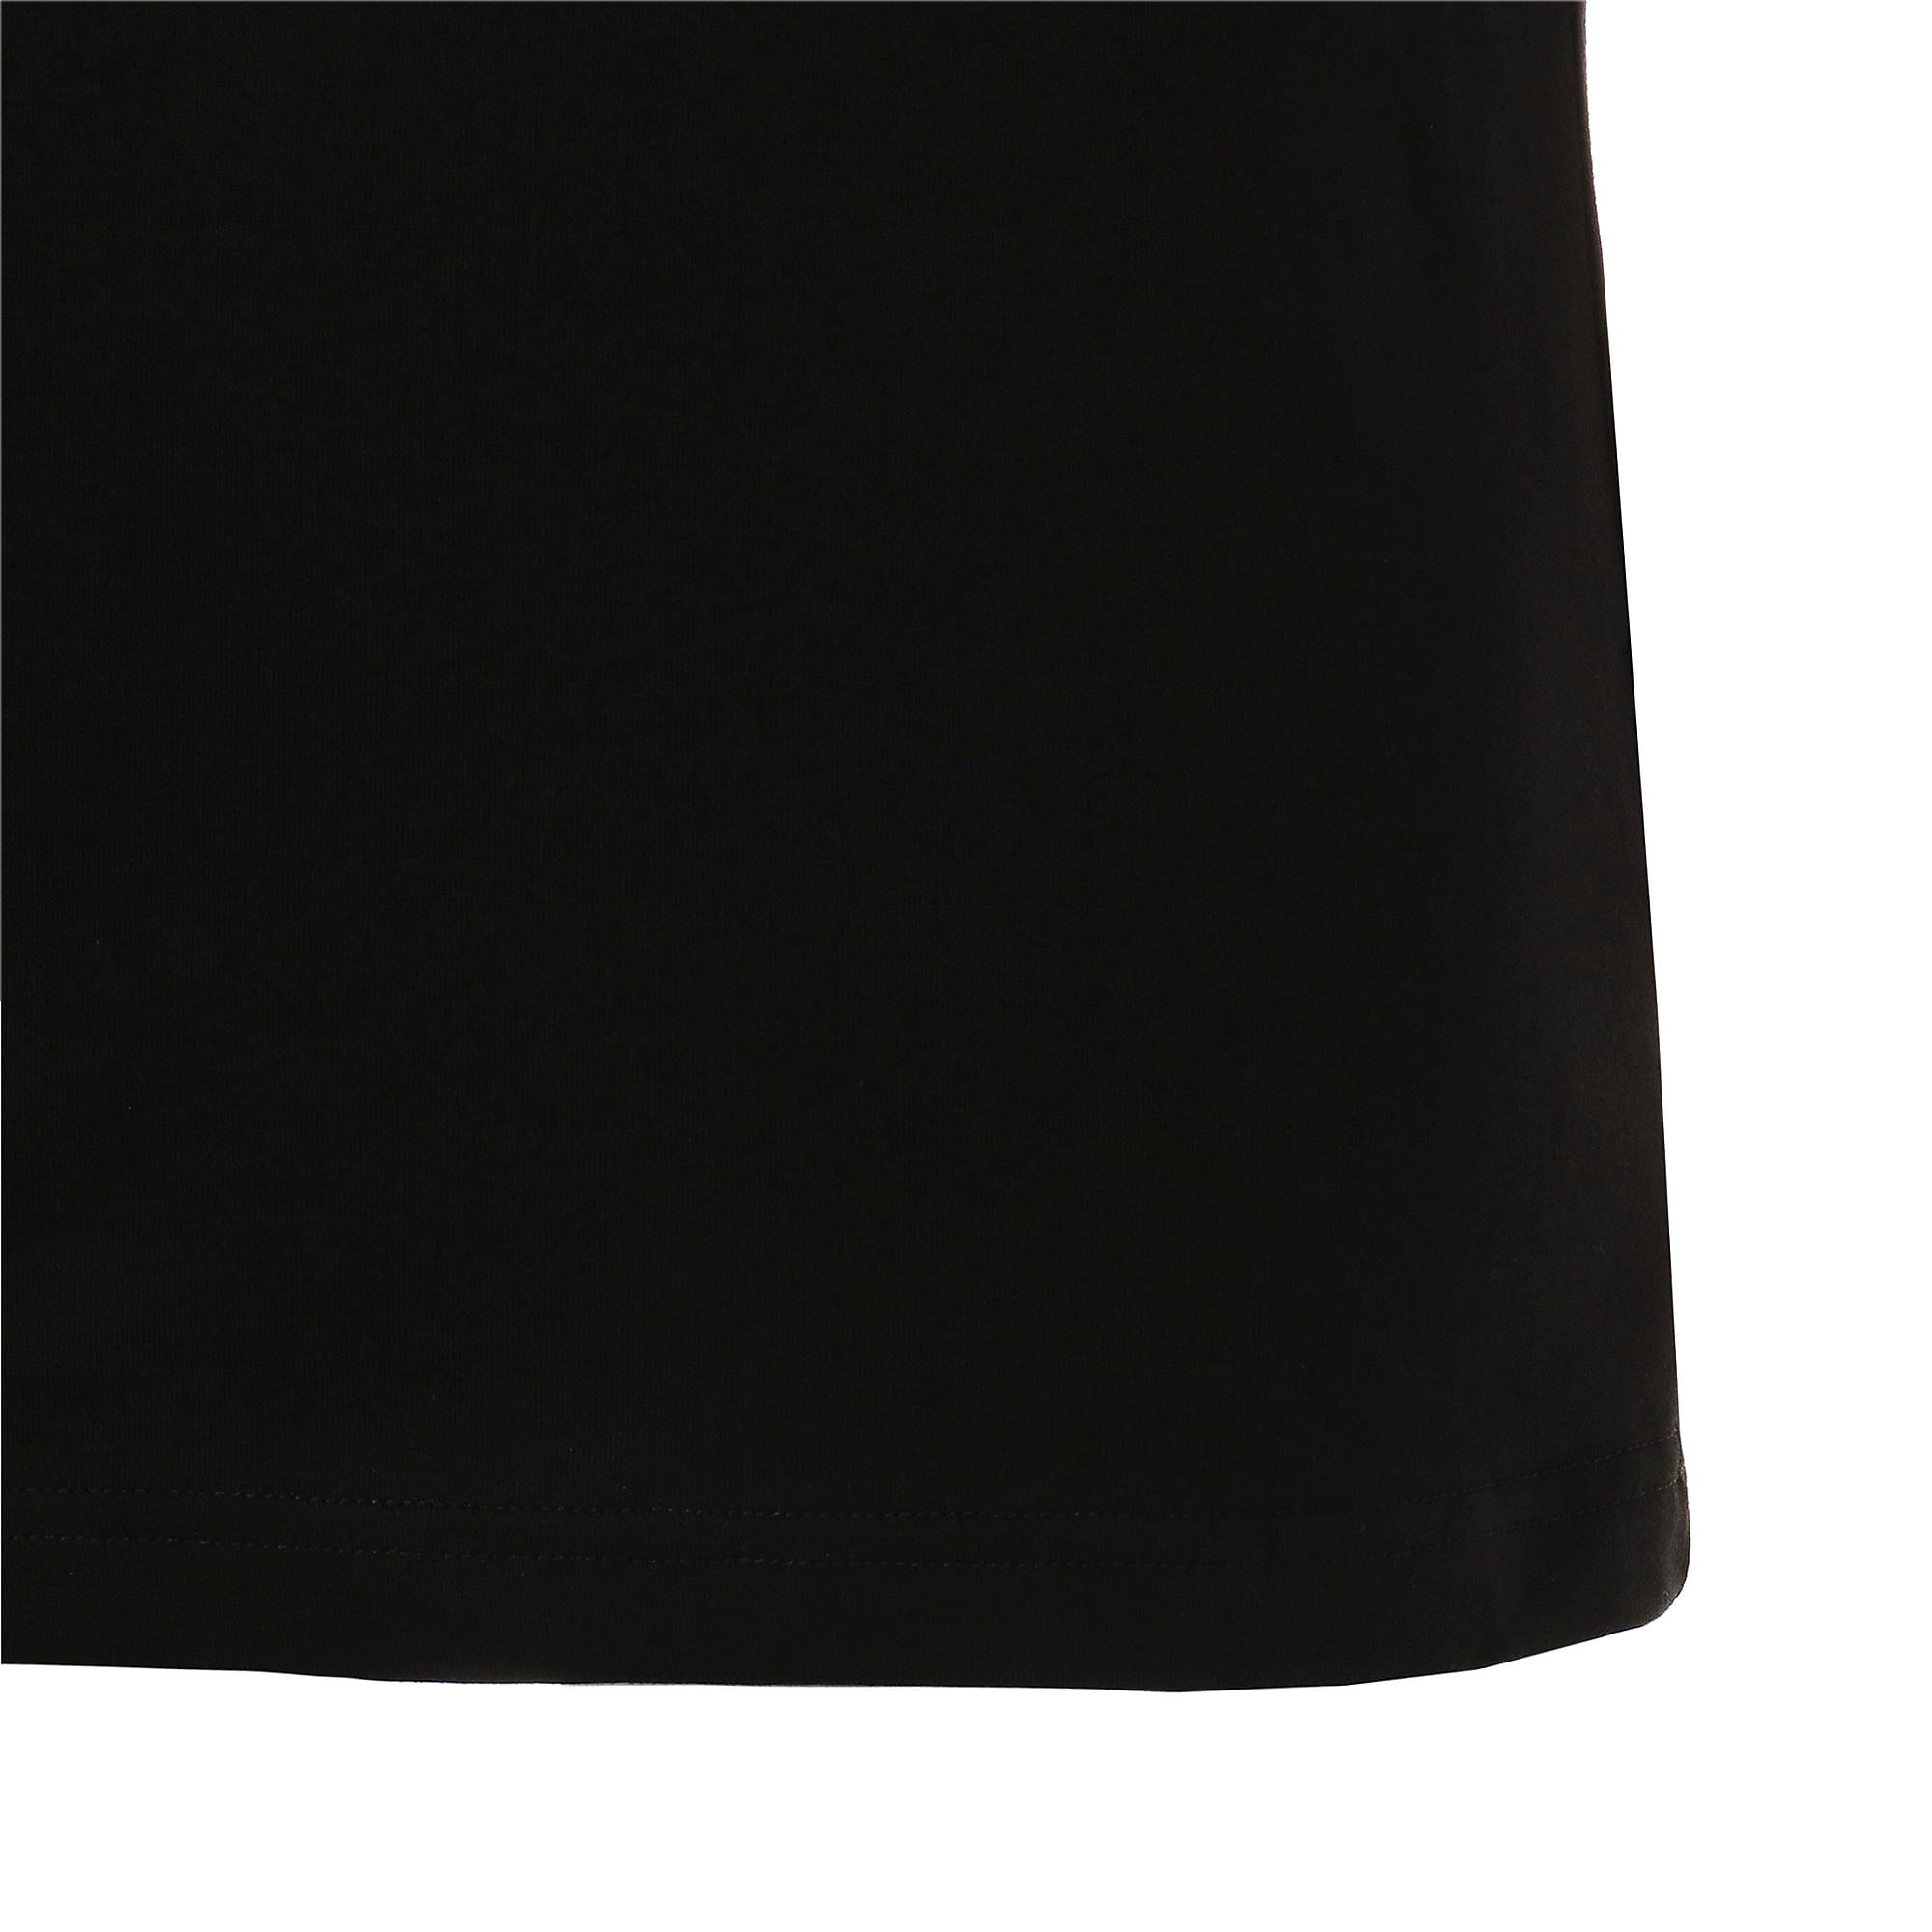 Thumbnail 6 of フェラーリ ビッグシールド Tシャツ + 半袖, Puma Black, medium-JPN